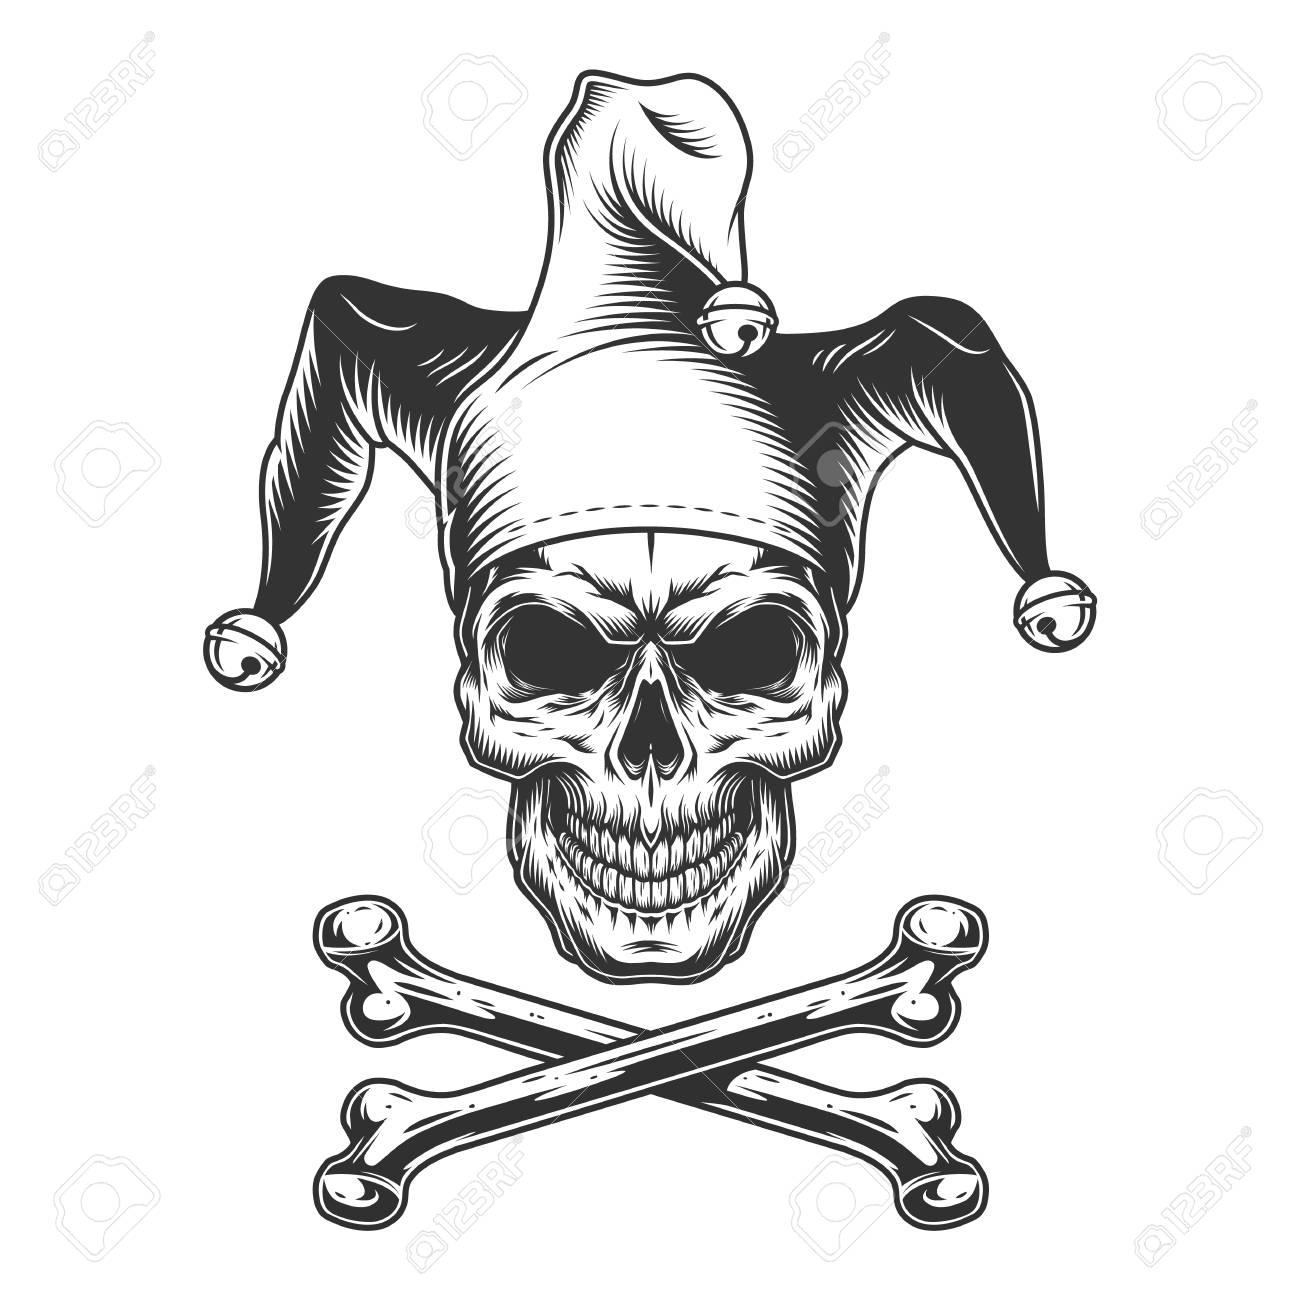 Vintage monochrome jester skull with crossbones isolated vector illustration - 115207247